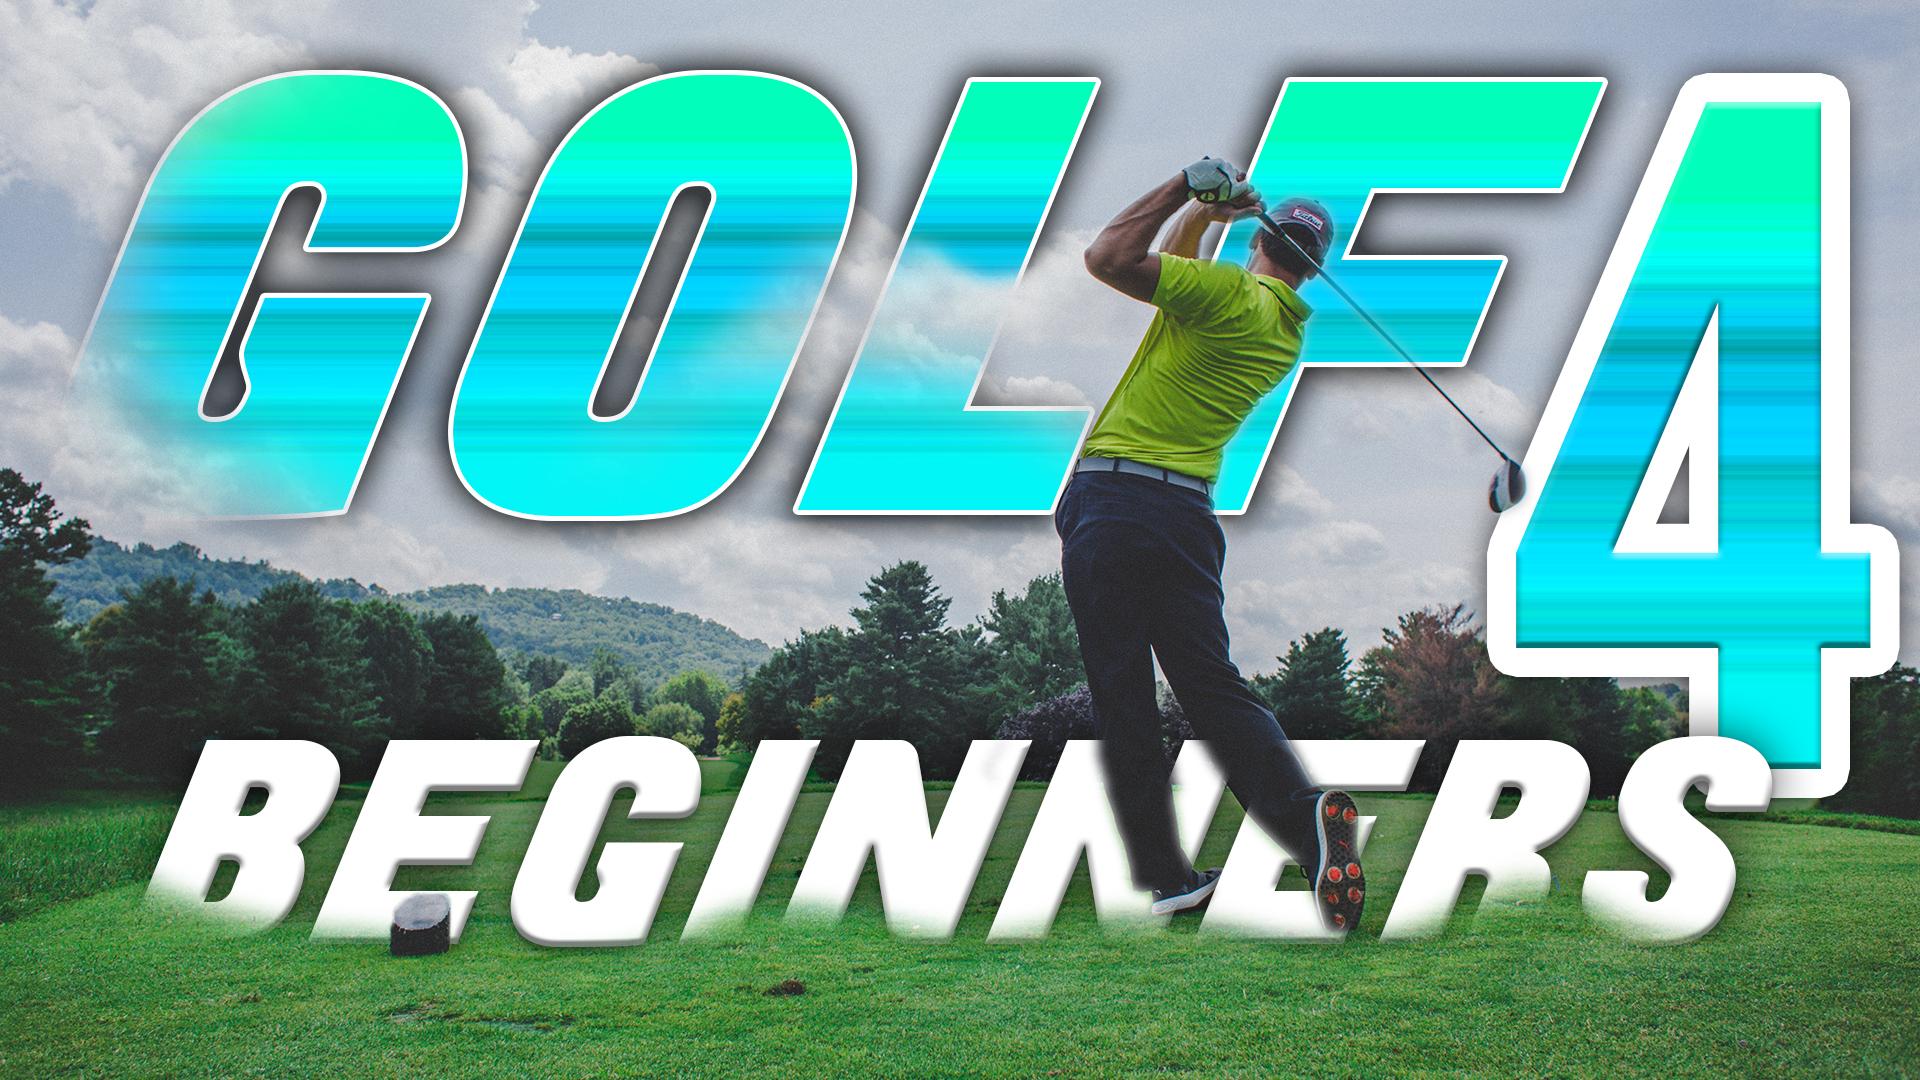 golf 4 beginners.jpg